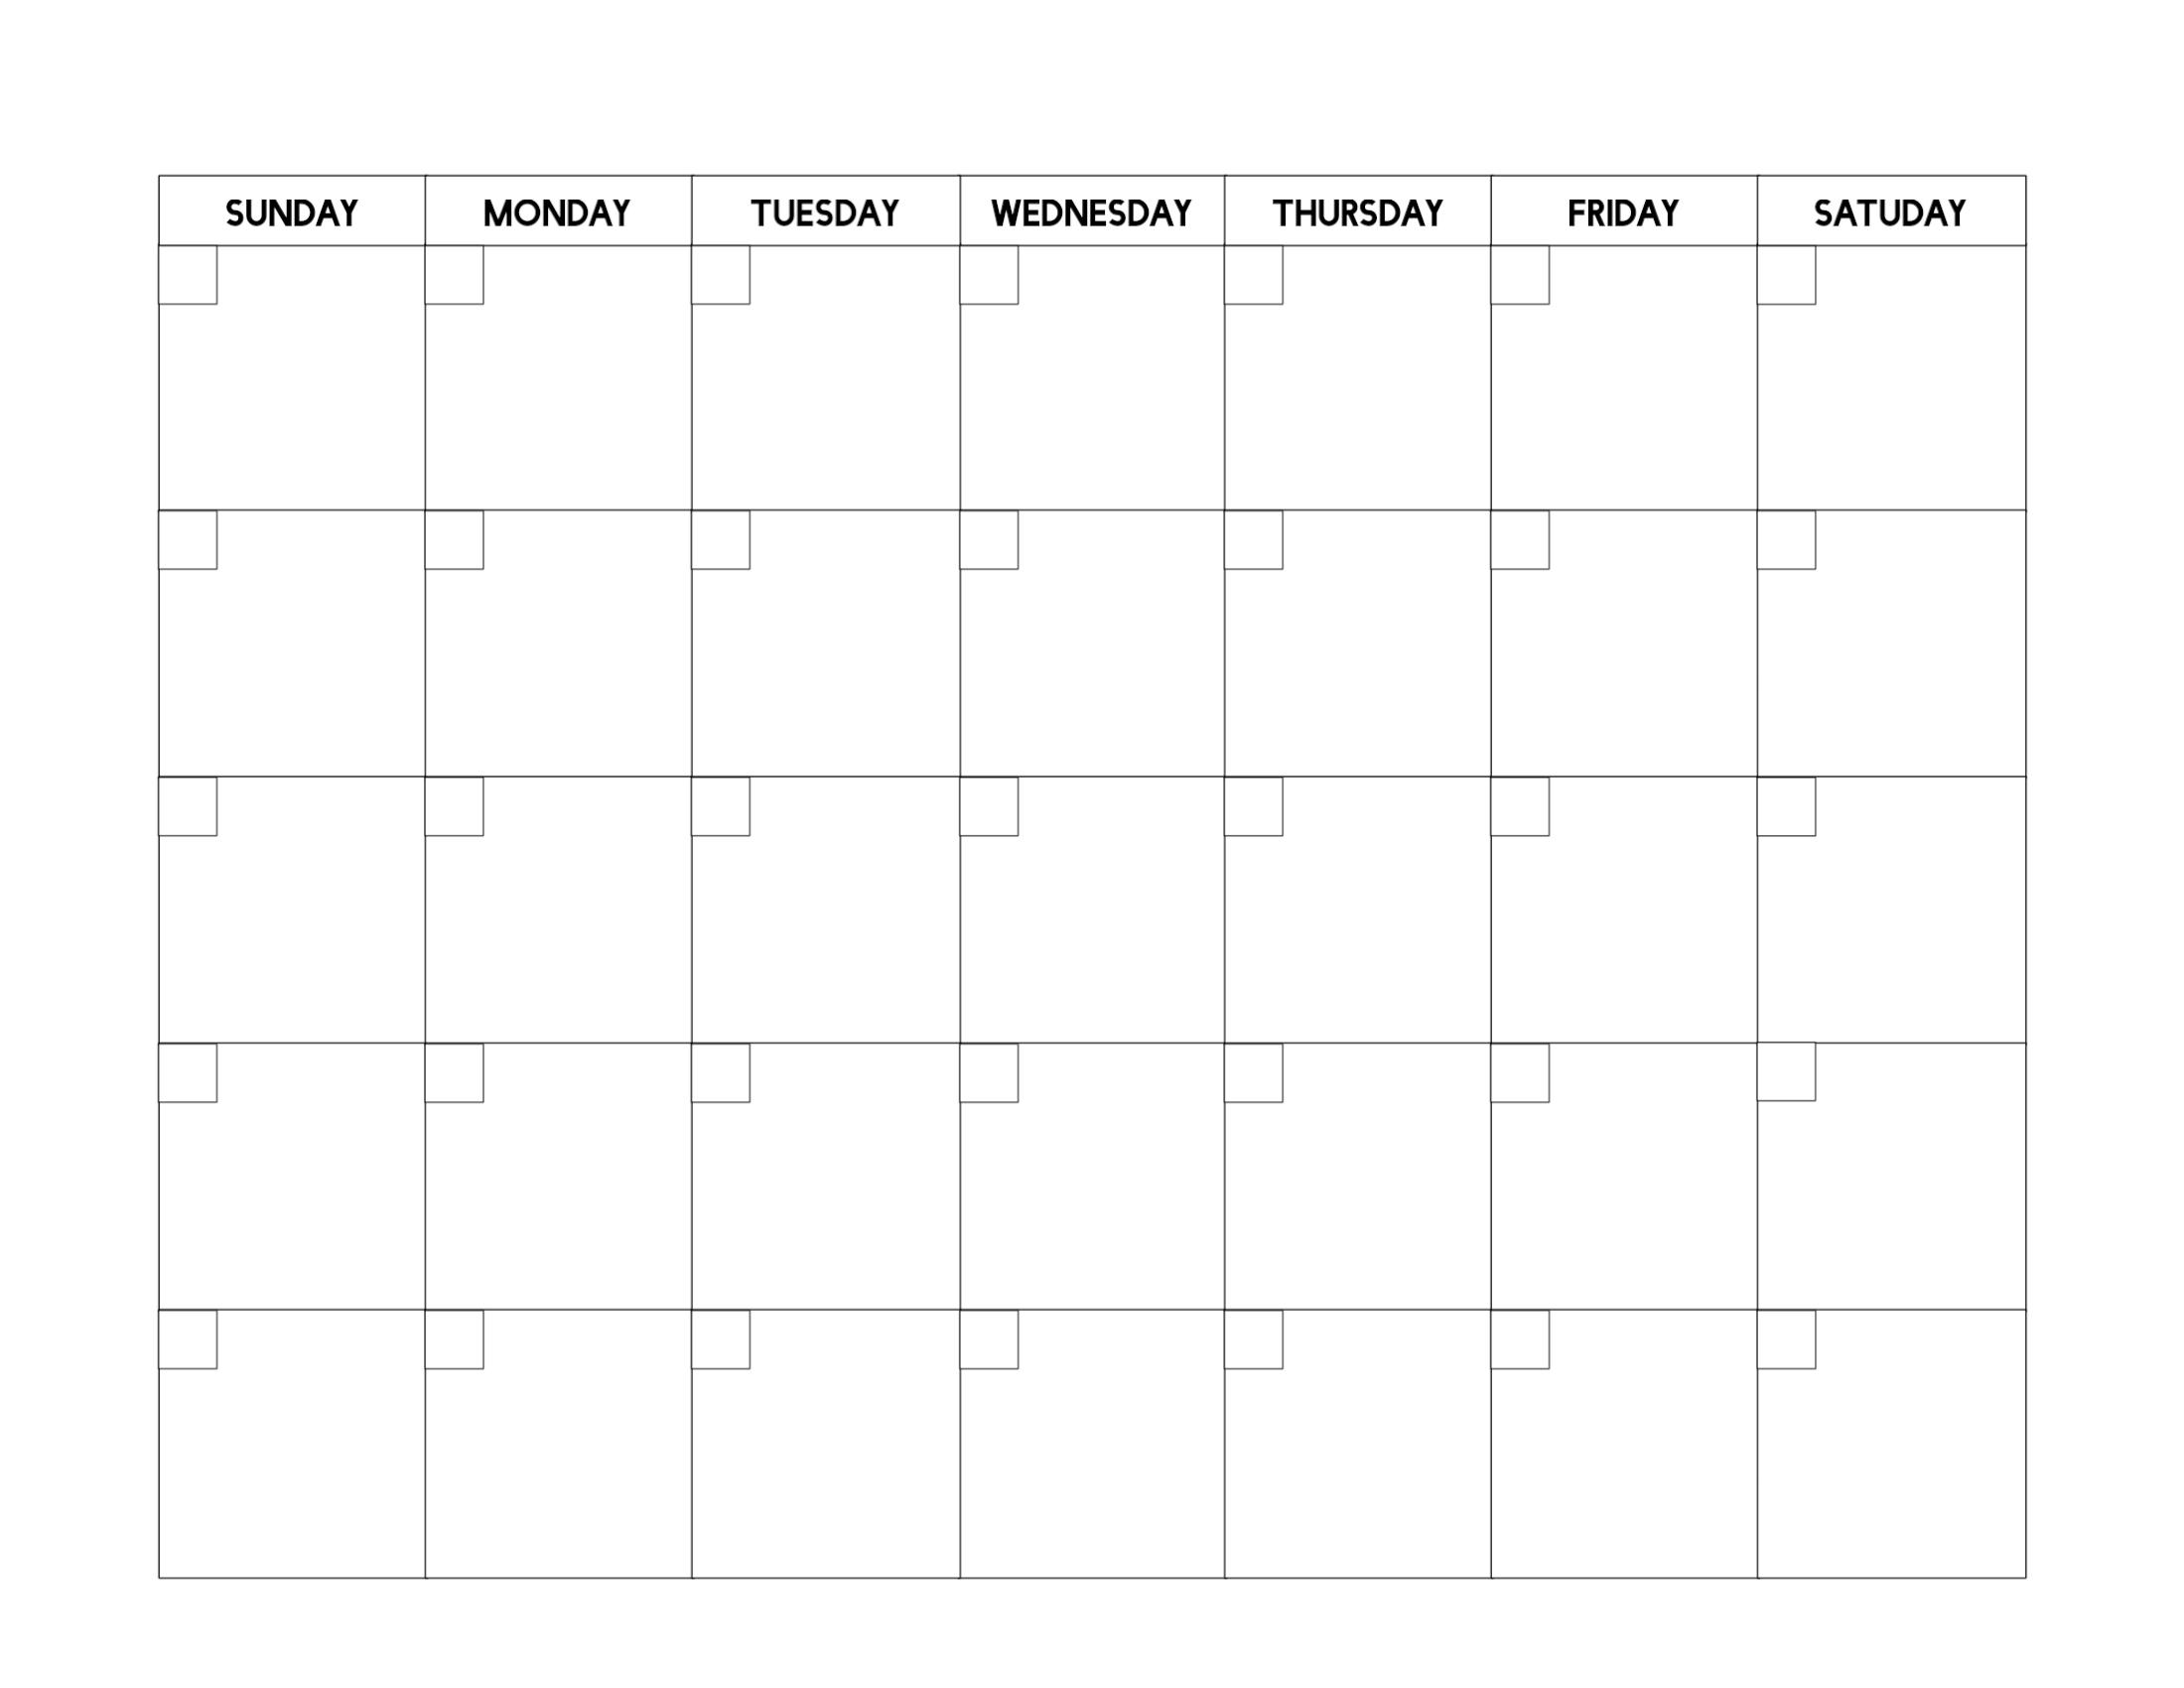 Free Printable Blank Calendar Template - Paper Trail Design in Free Printable Blank Calendar Templates